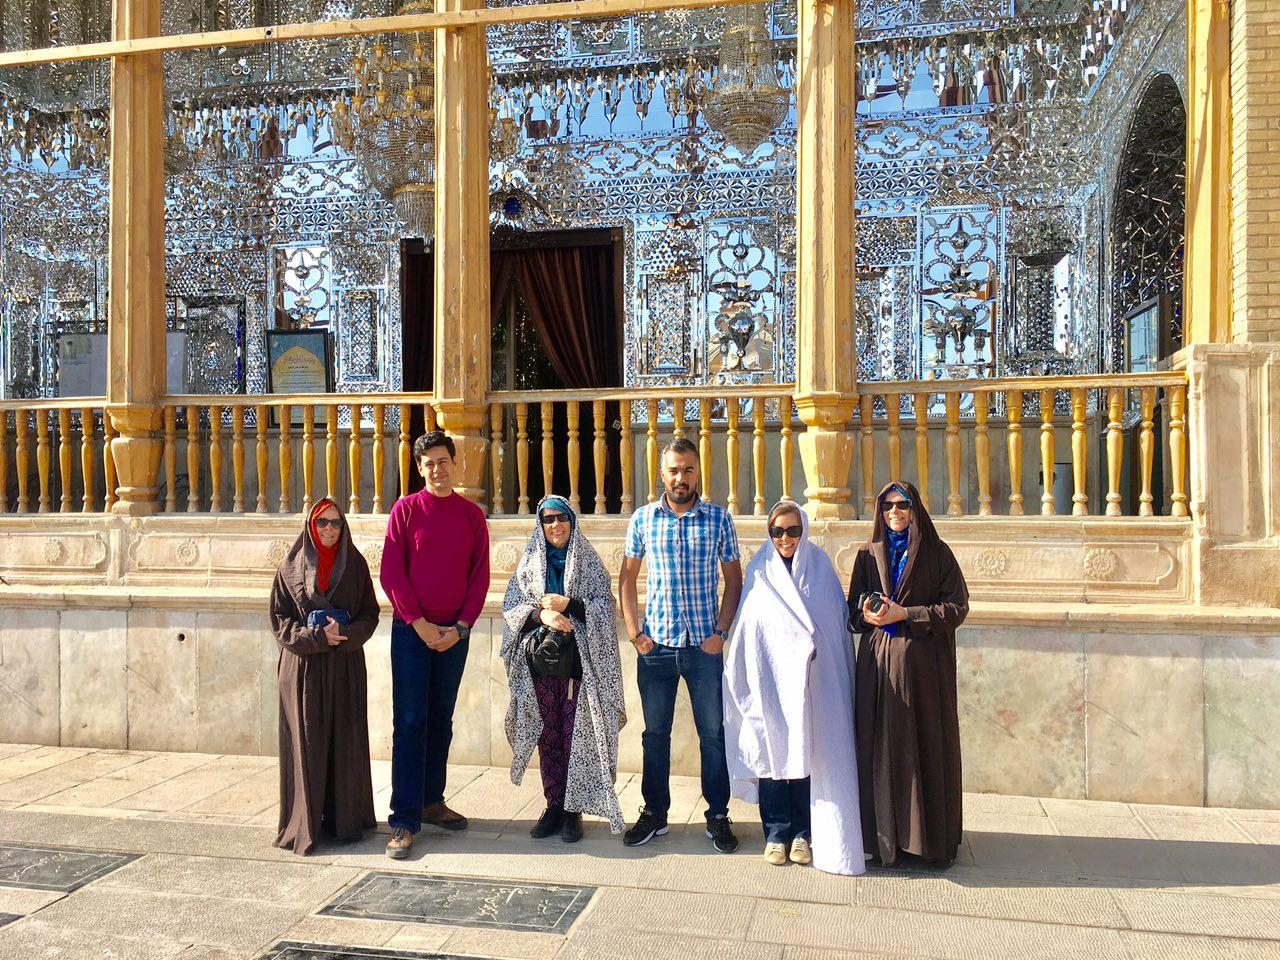 Shah-e-cheragh Holy Shrine In Shiraz